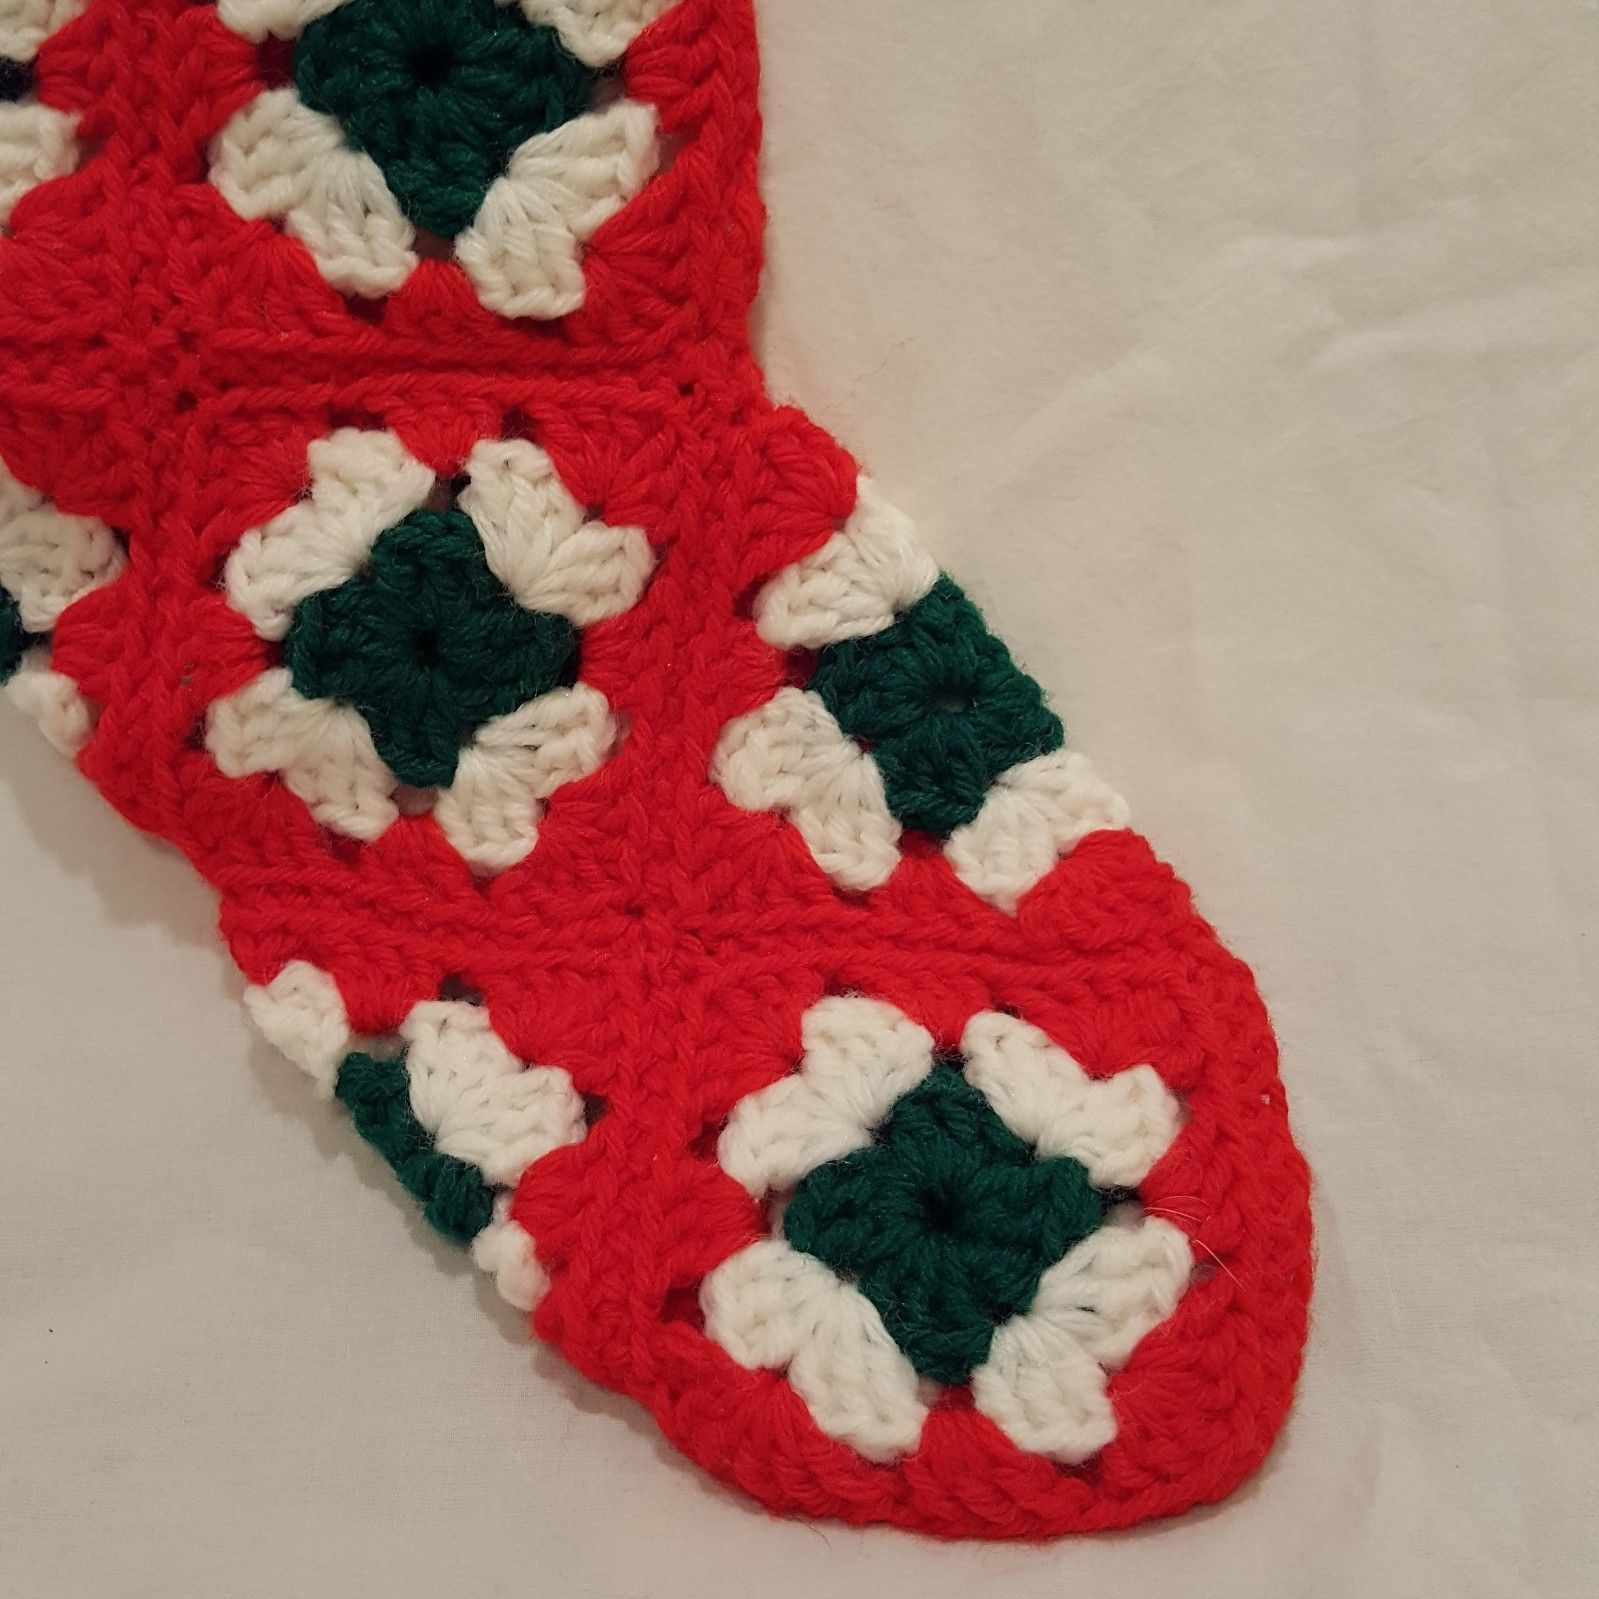 "Vintage Stocking Granny Square Crochet Handmade Red White Green 15"""